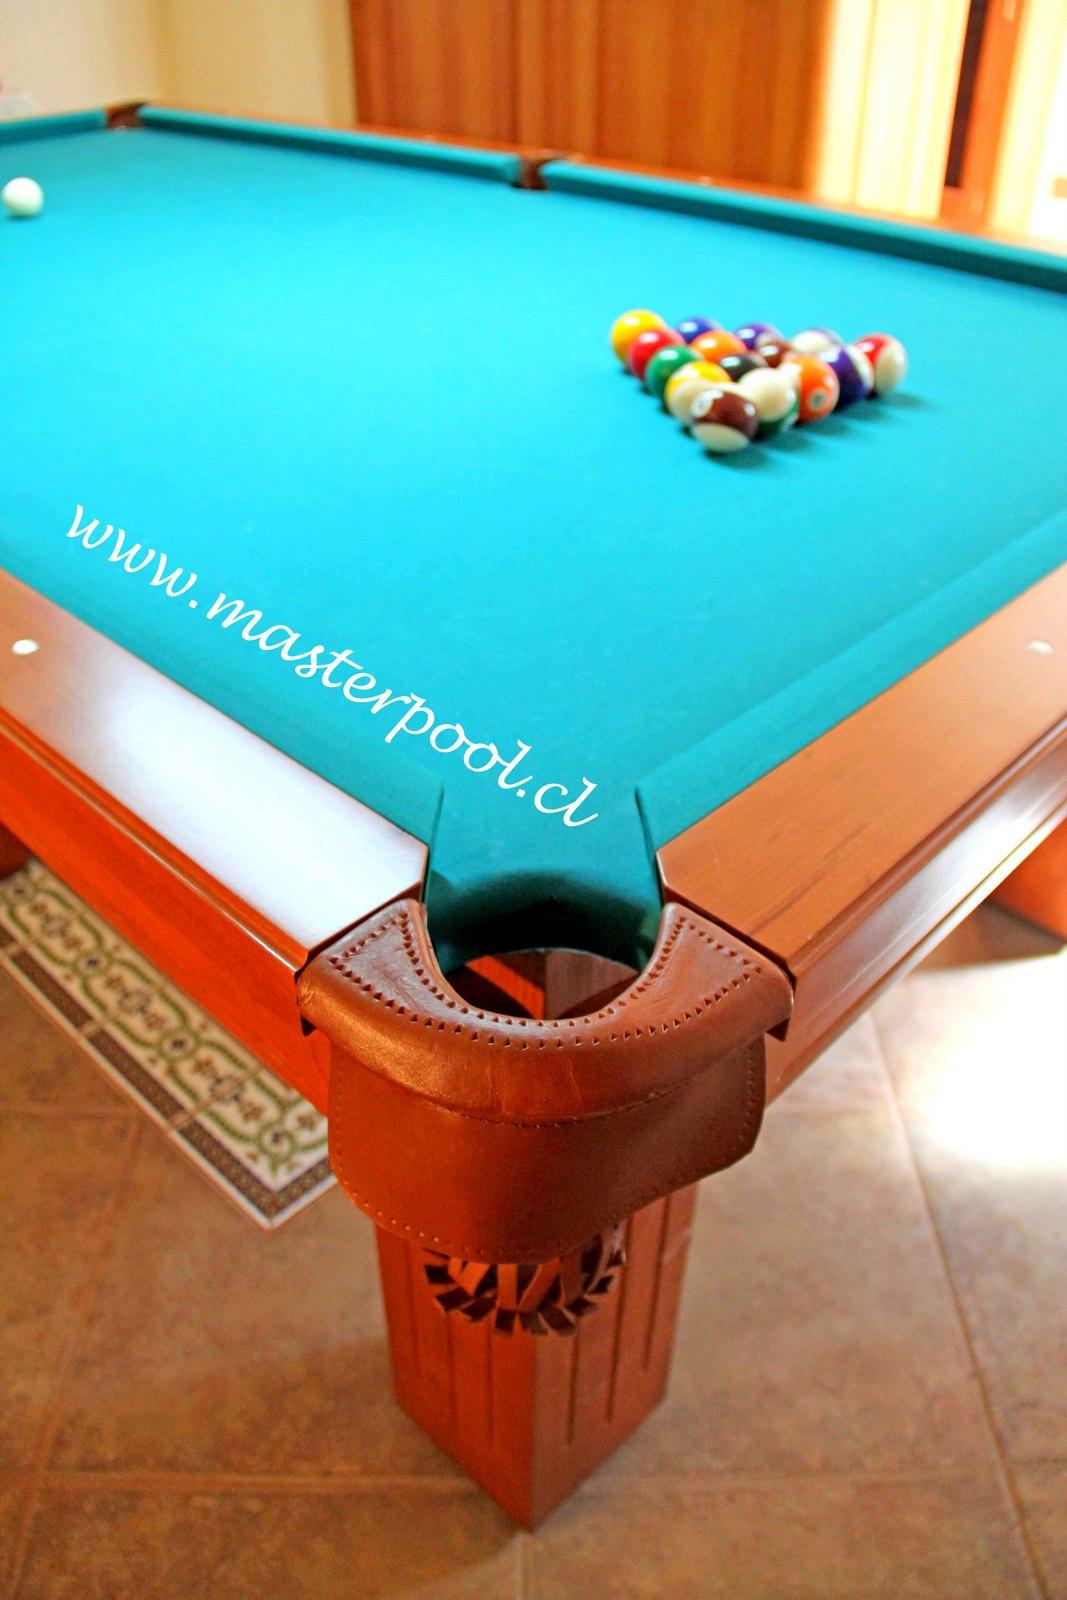 1-MasterPool-11-001